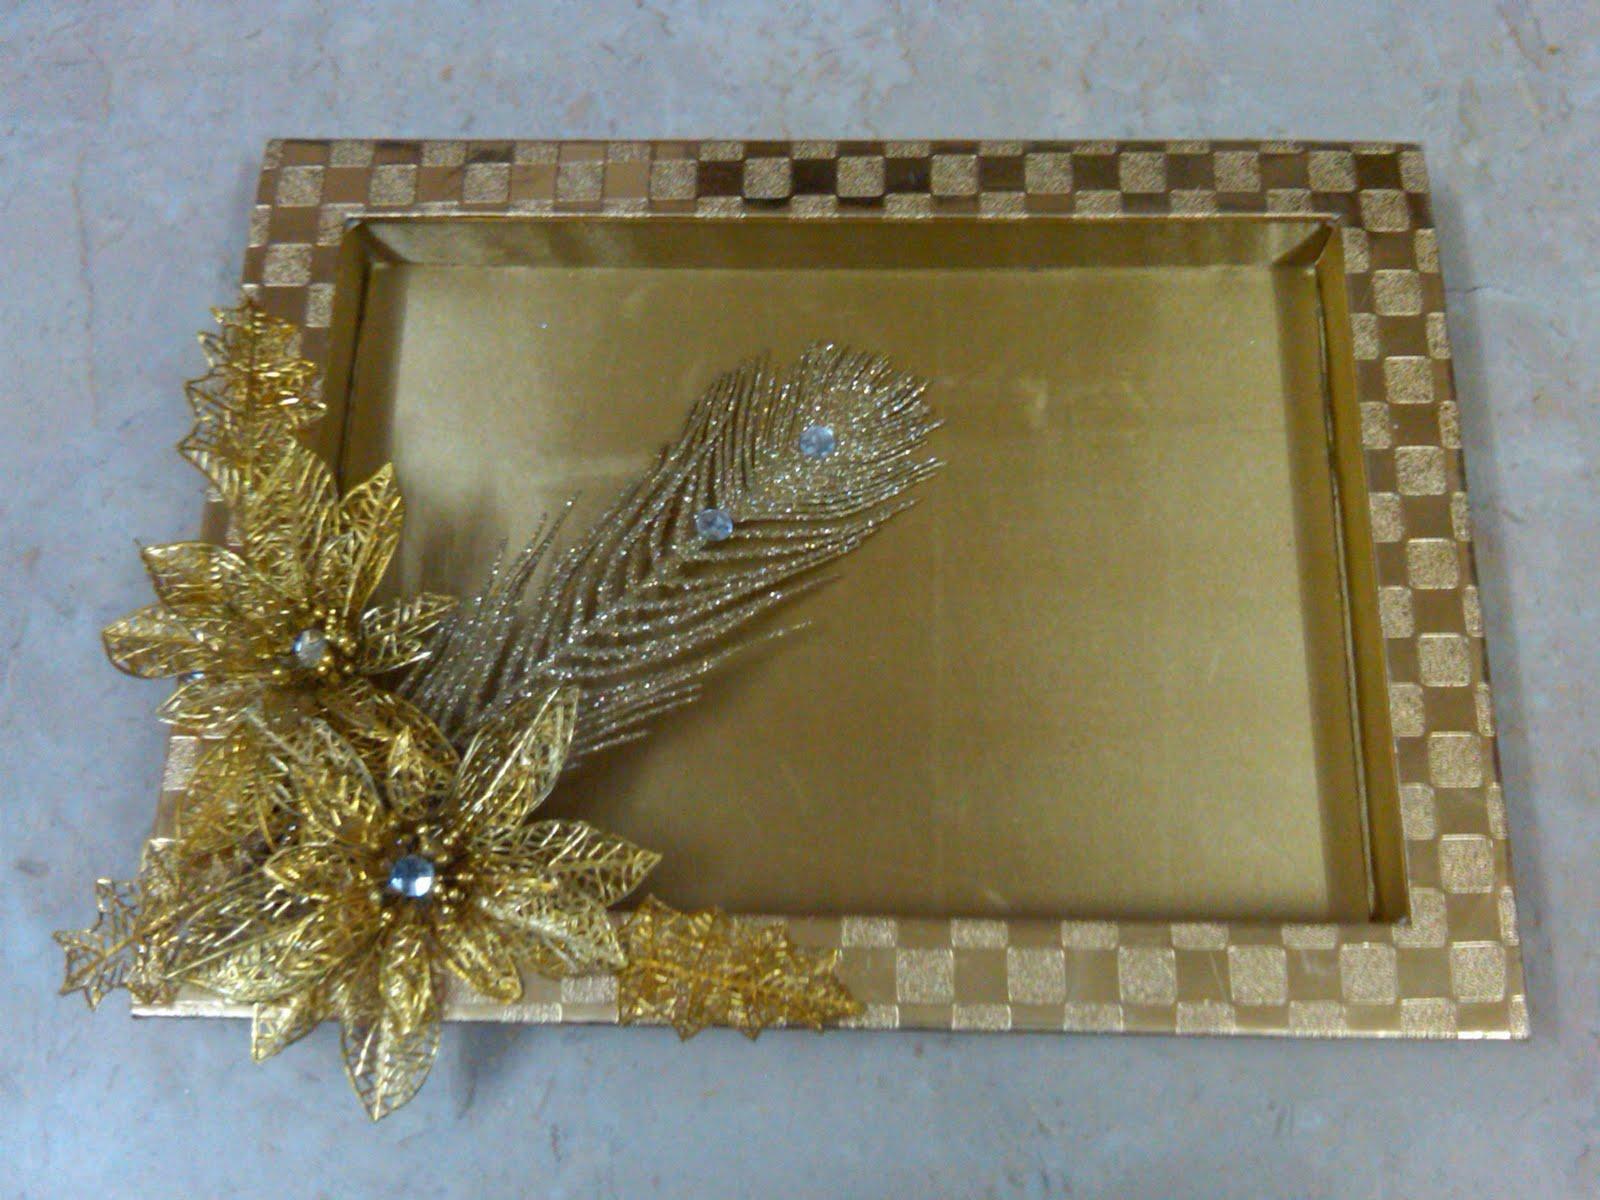 Trousseau Packing Tray Decorative Wedding Indian Decoration Home